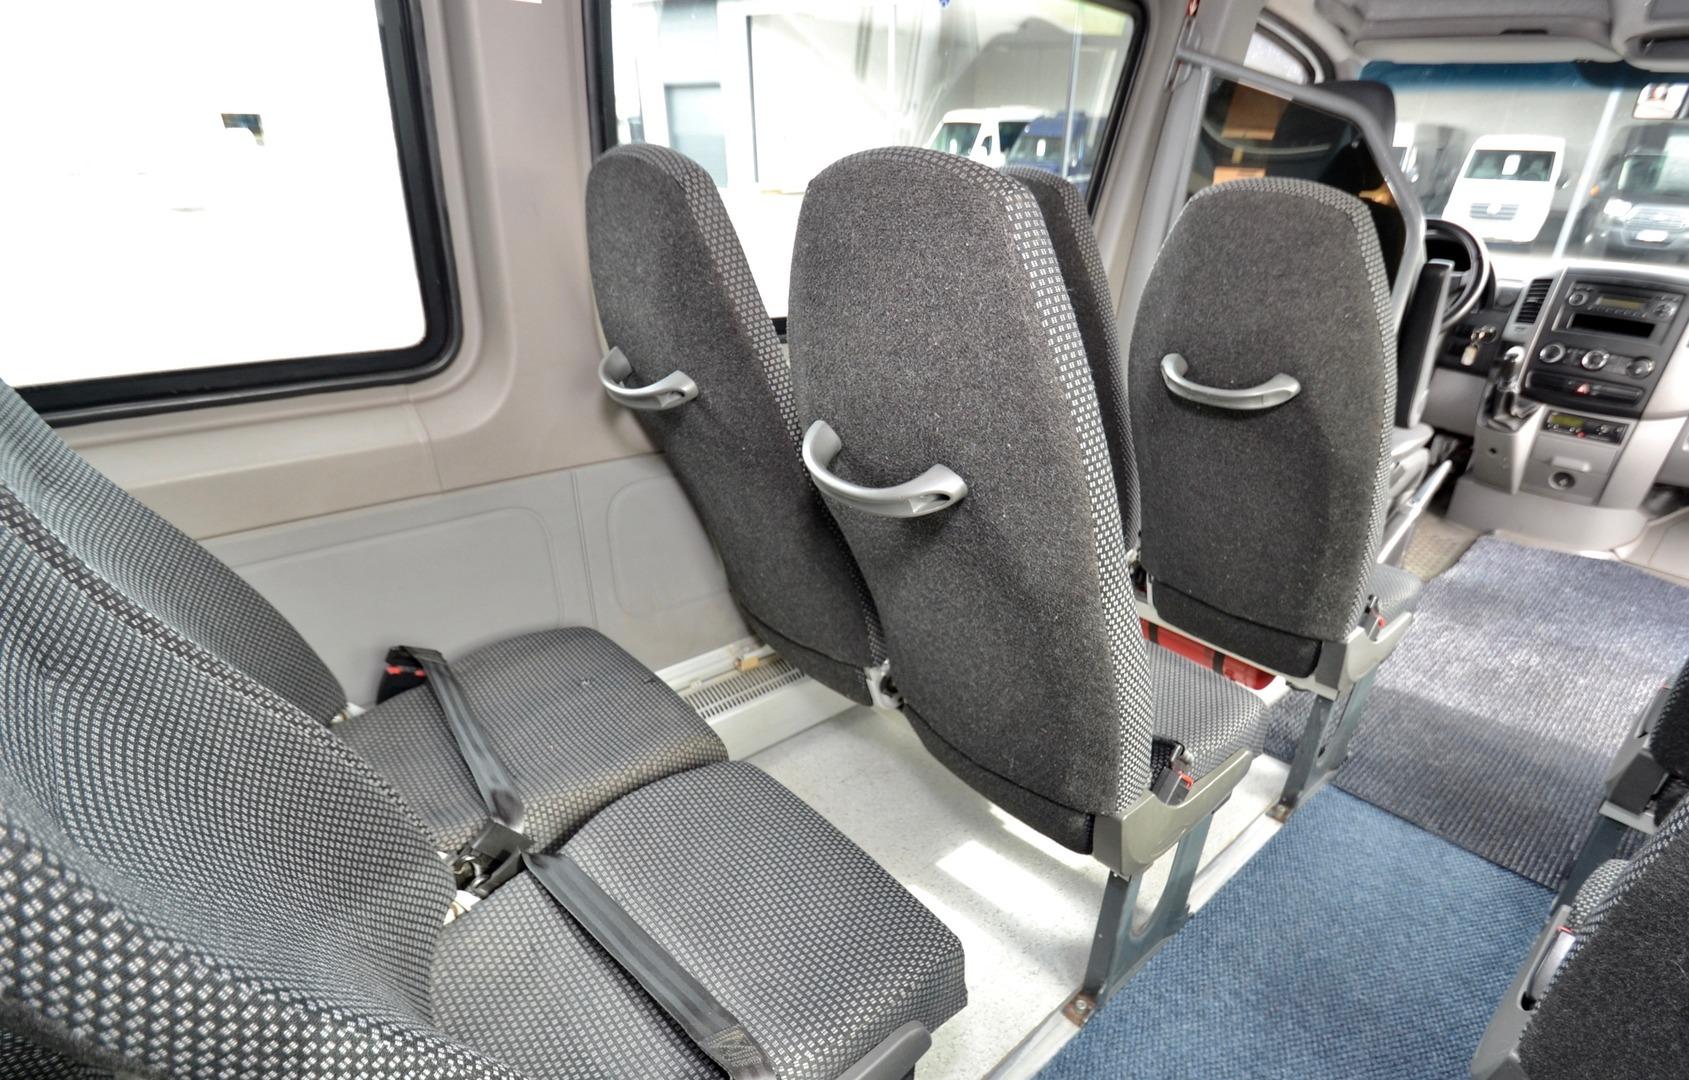 Mercedes-Benz Sprinter, SPRINTER 515 KA Yksikerroksinen (CA) 2ov 2150cm3